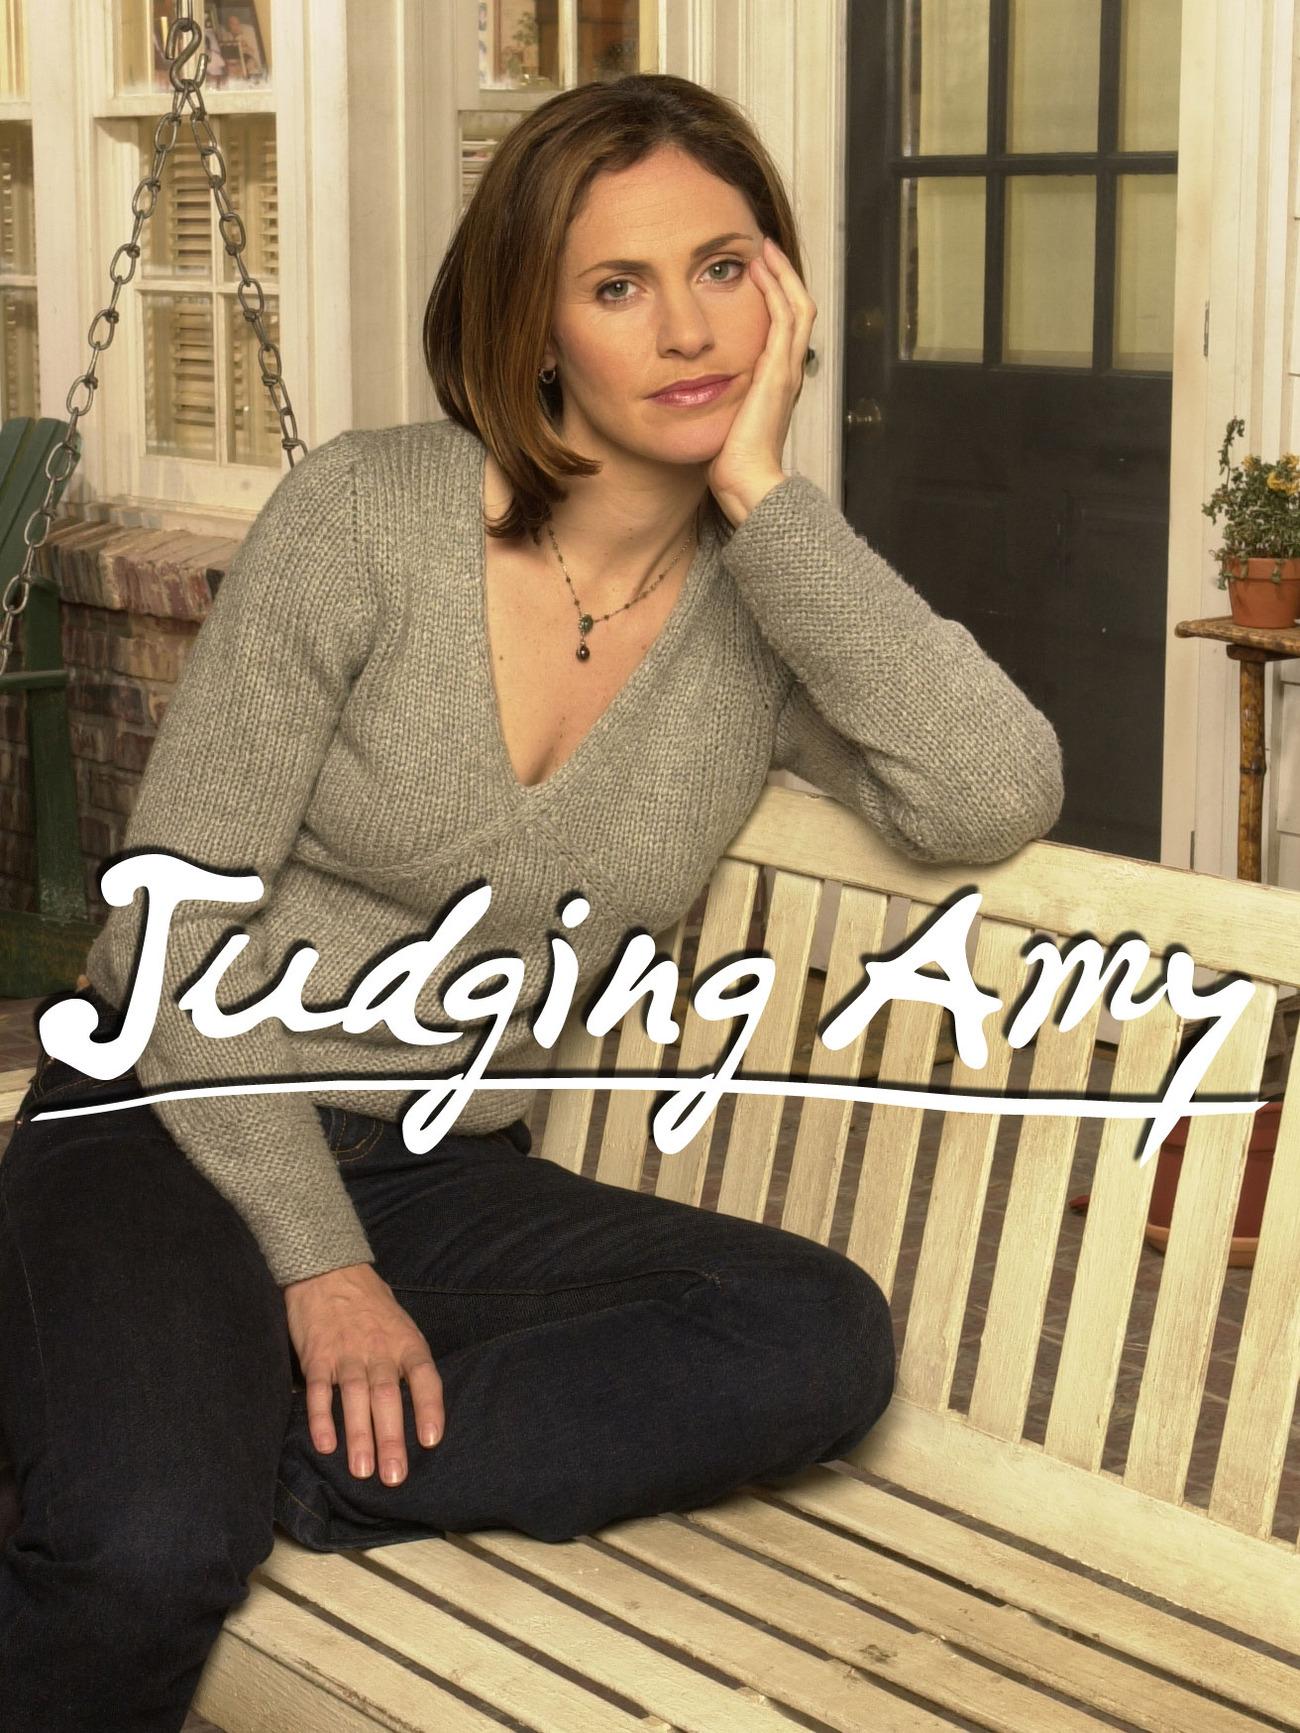 Judging Amy: Season 5